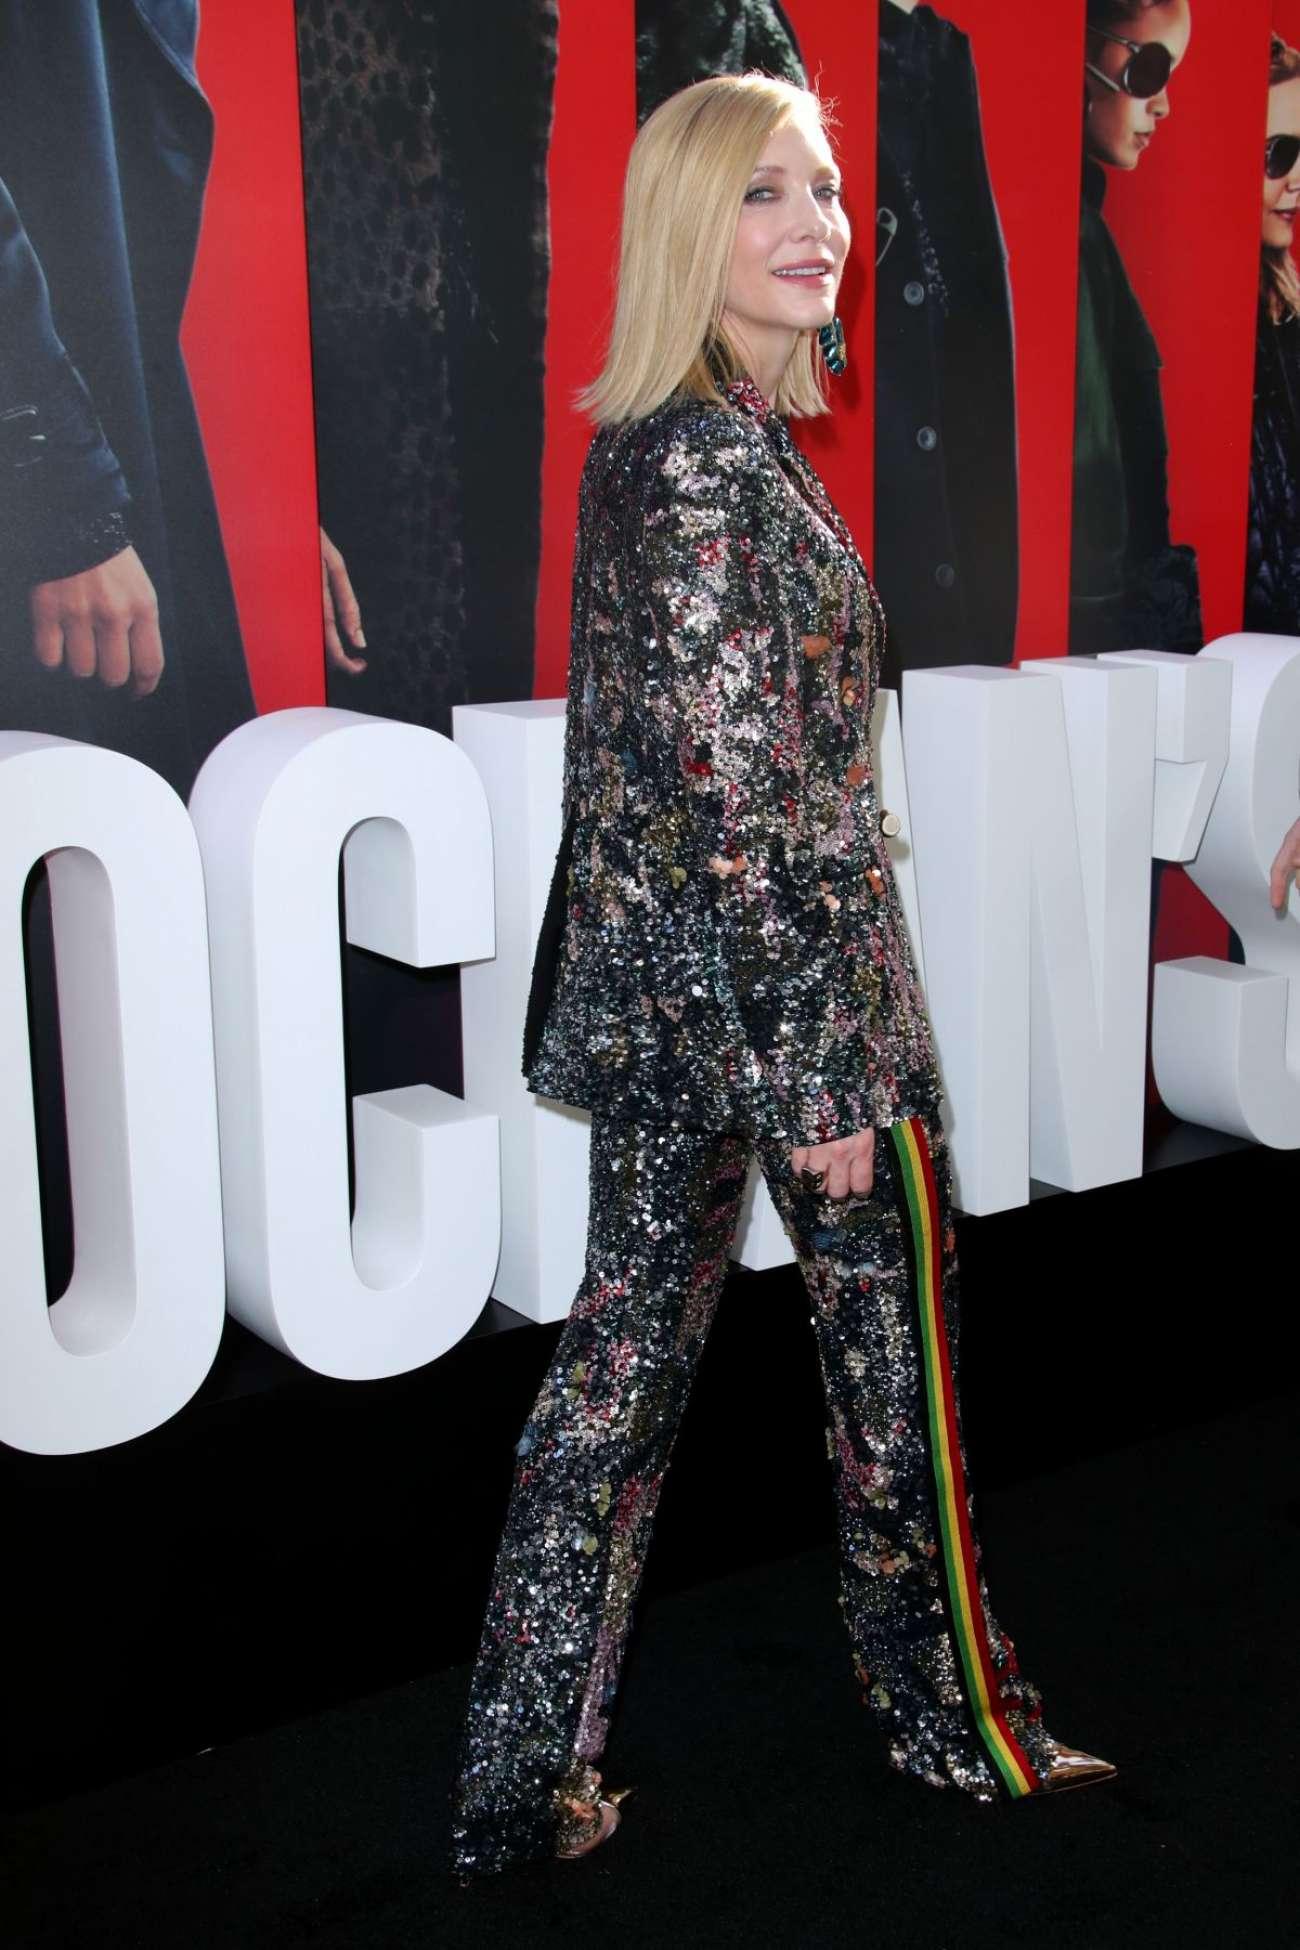 Cate Blanchett 2018 : Cate Blanchett: Ocean's 8 Premiere photocall In New York-02